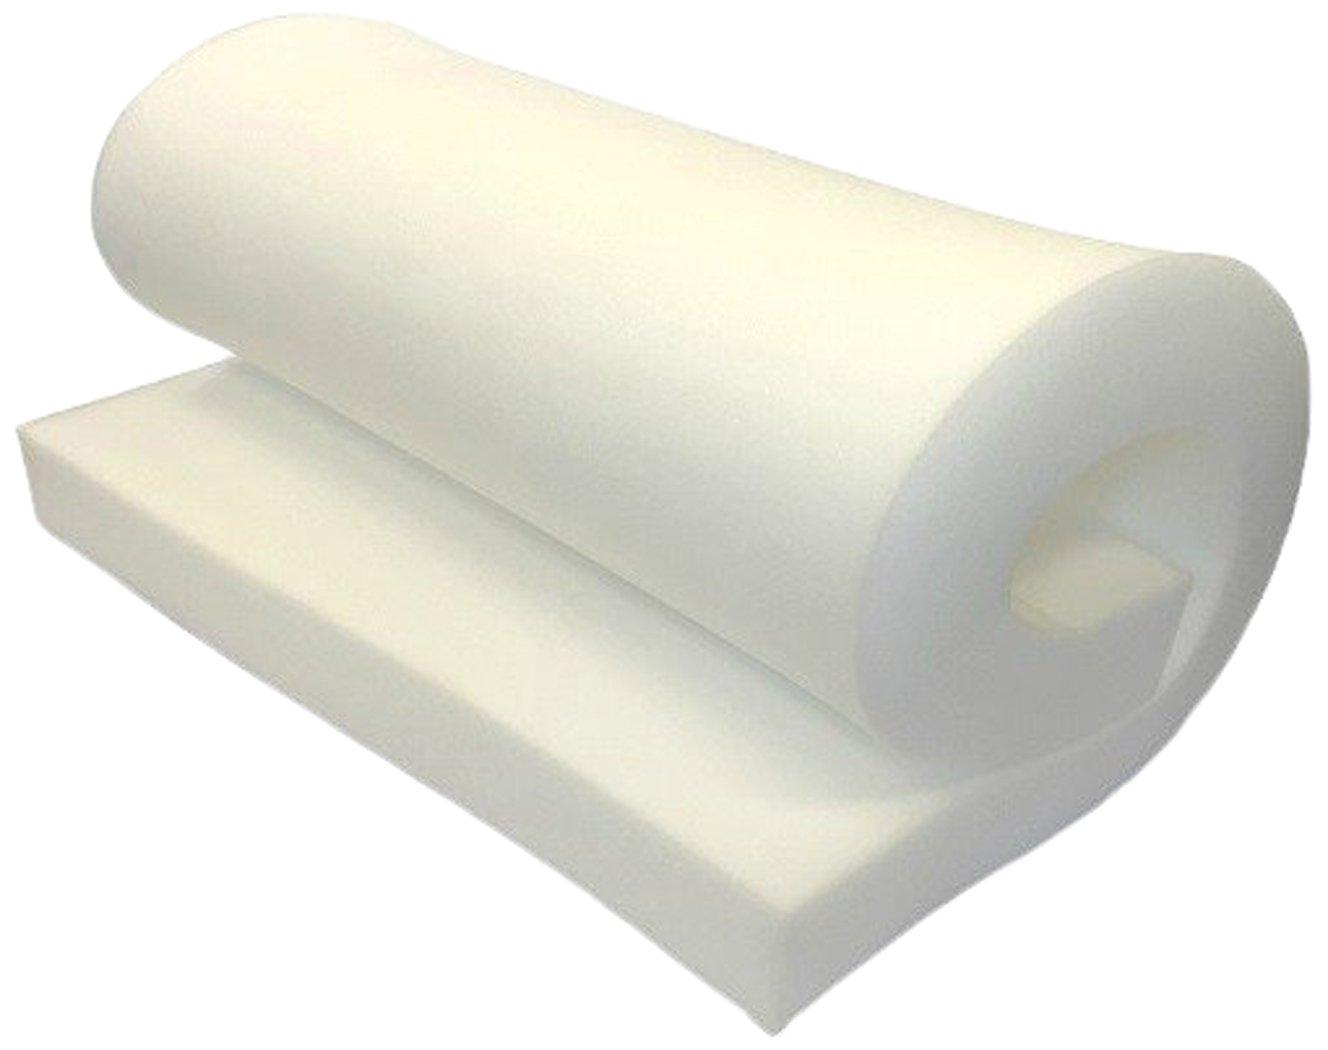 FoamRush FM012472 High Density Upholstery Foam Cushion, Seat Replacement, Upholstery Sheet 1'' x 24'' x 72'' by FoamRush